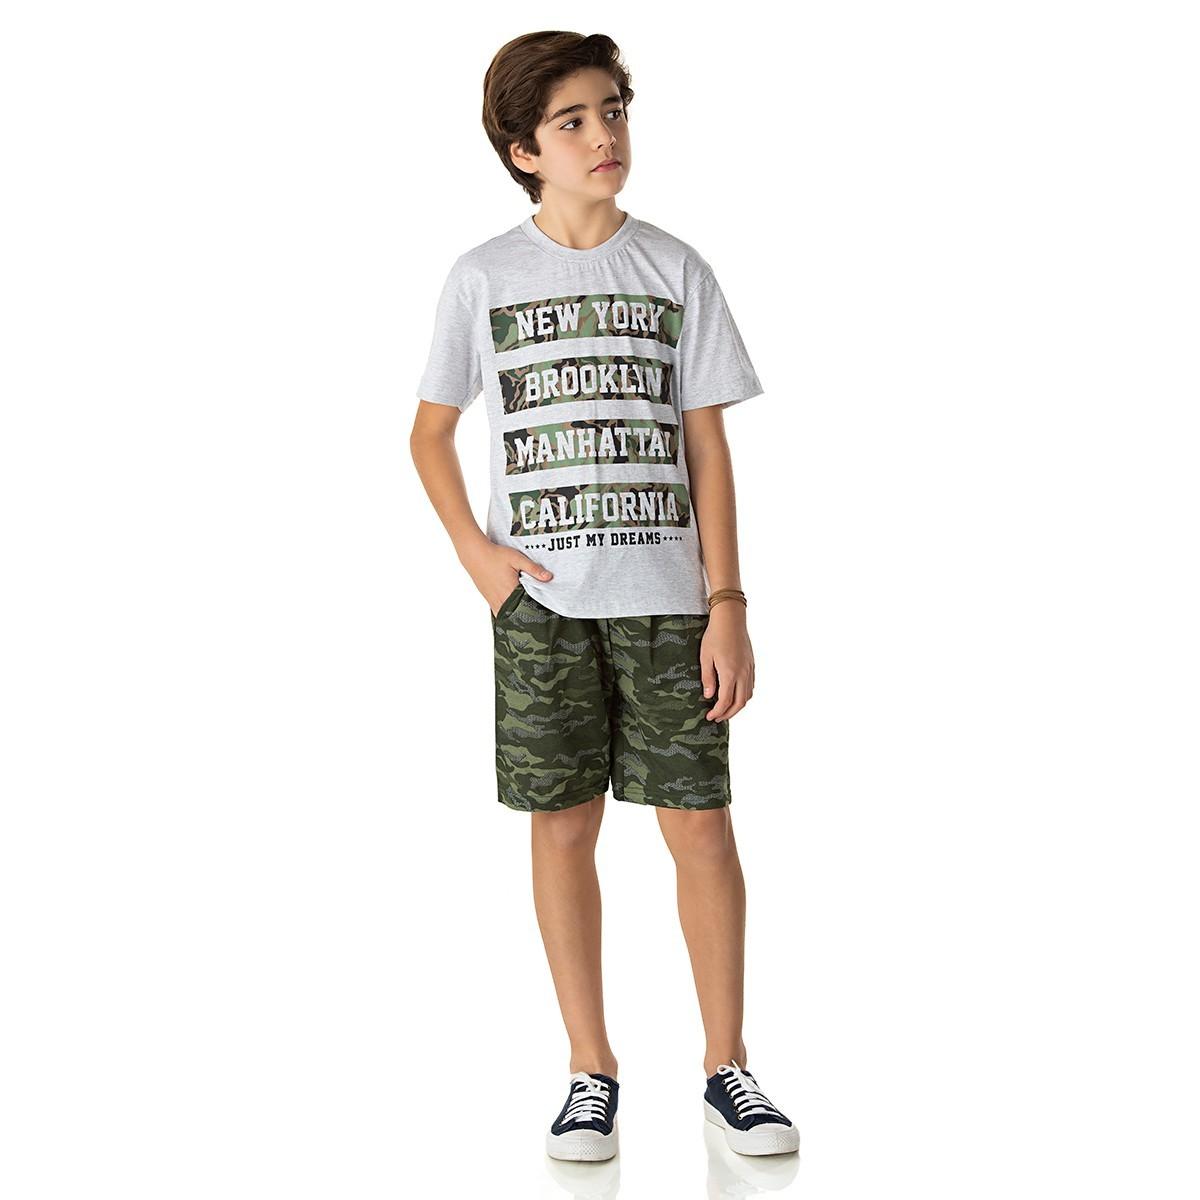 Conjunto Juvenil Menino New York Camuflado Mescla Isensee